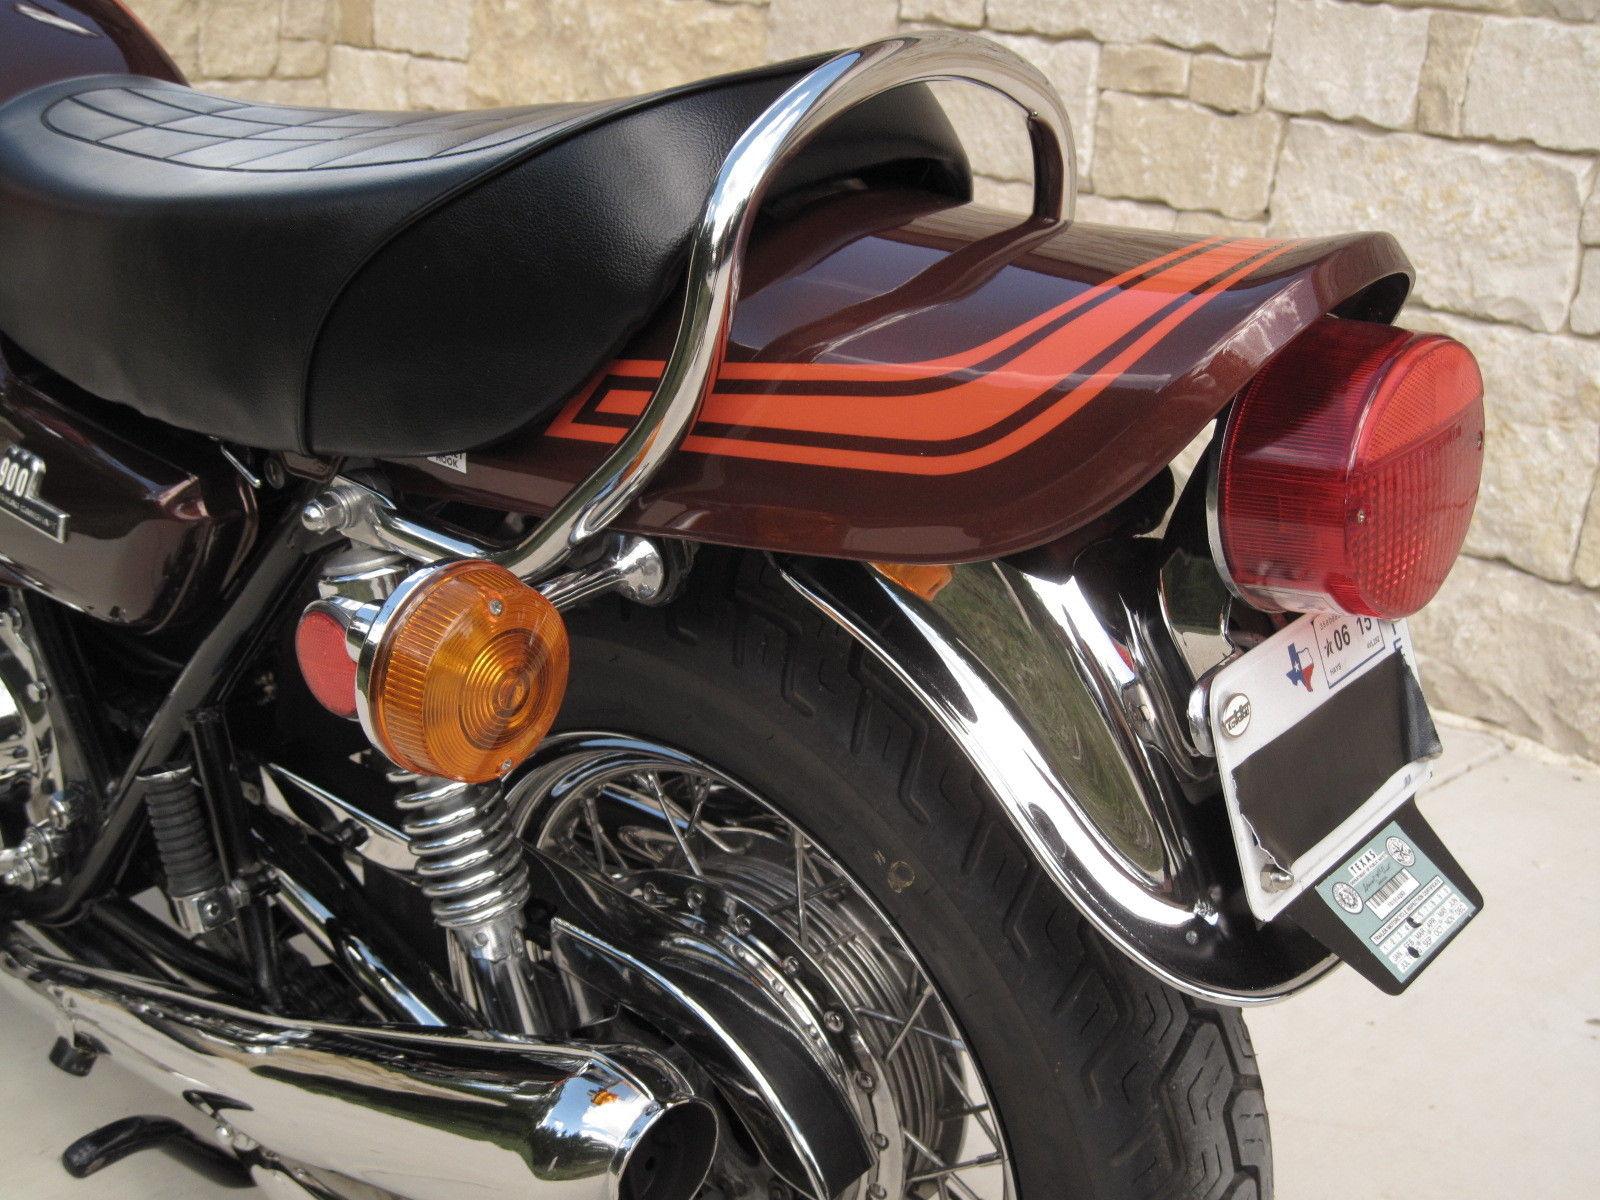 Kawasaki Z1 - 1973 - Tail Piece, Rear Mudguard, Rear Light and Indicator.